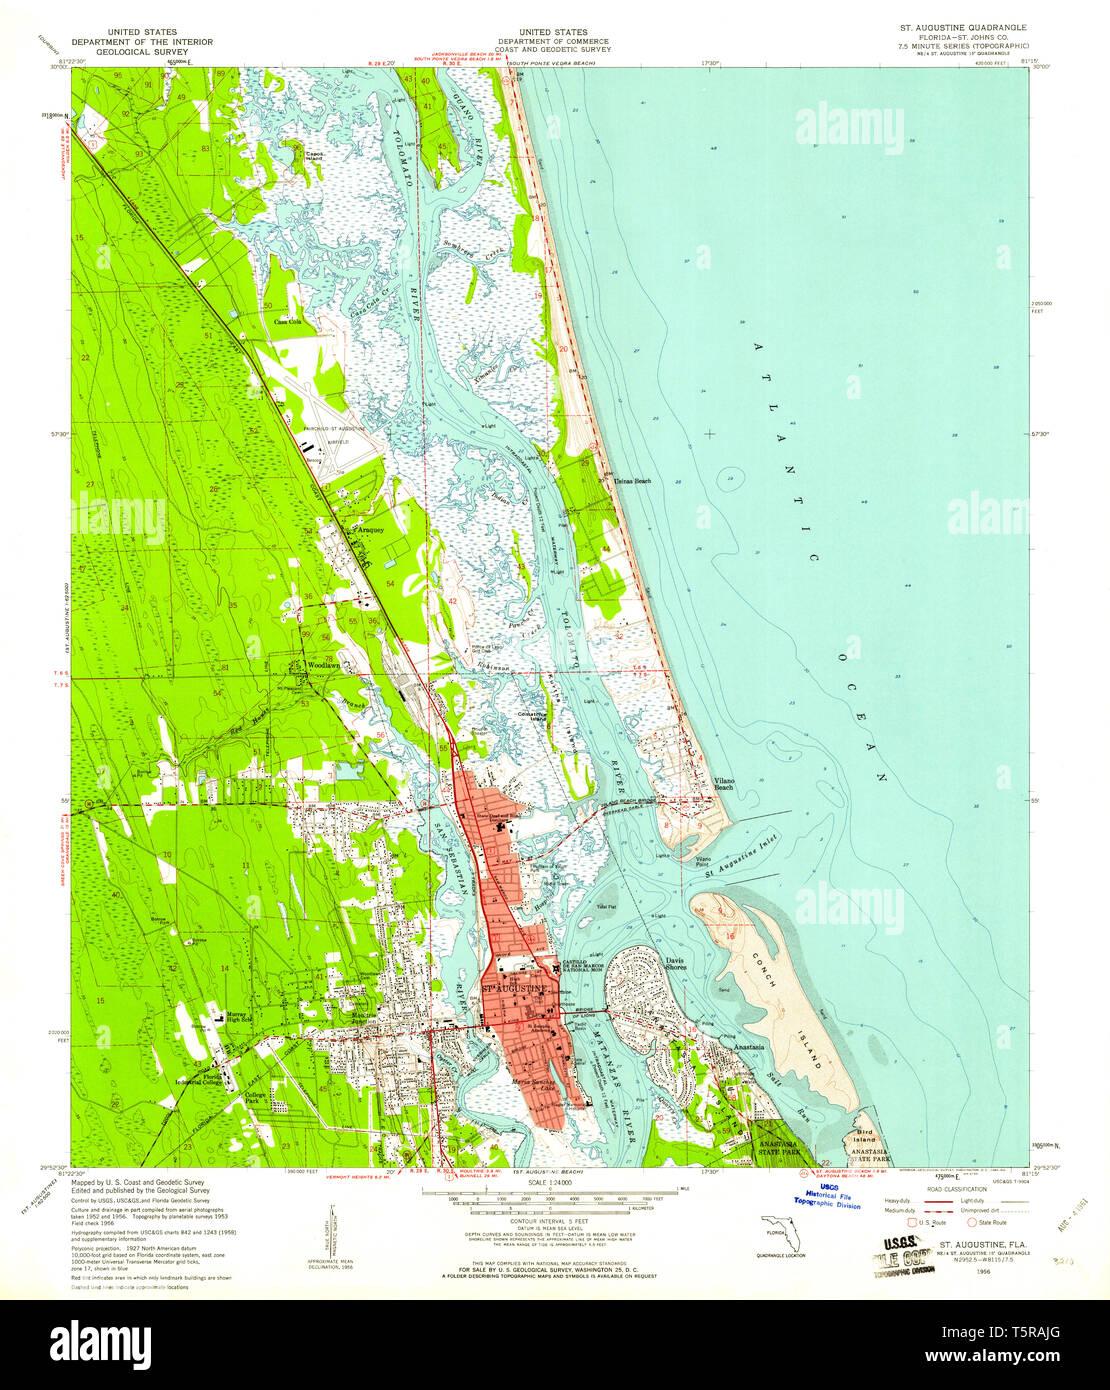 St  Augustine Florida Map Stock Photos & St  Augustine